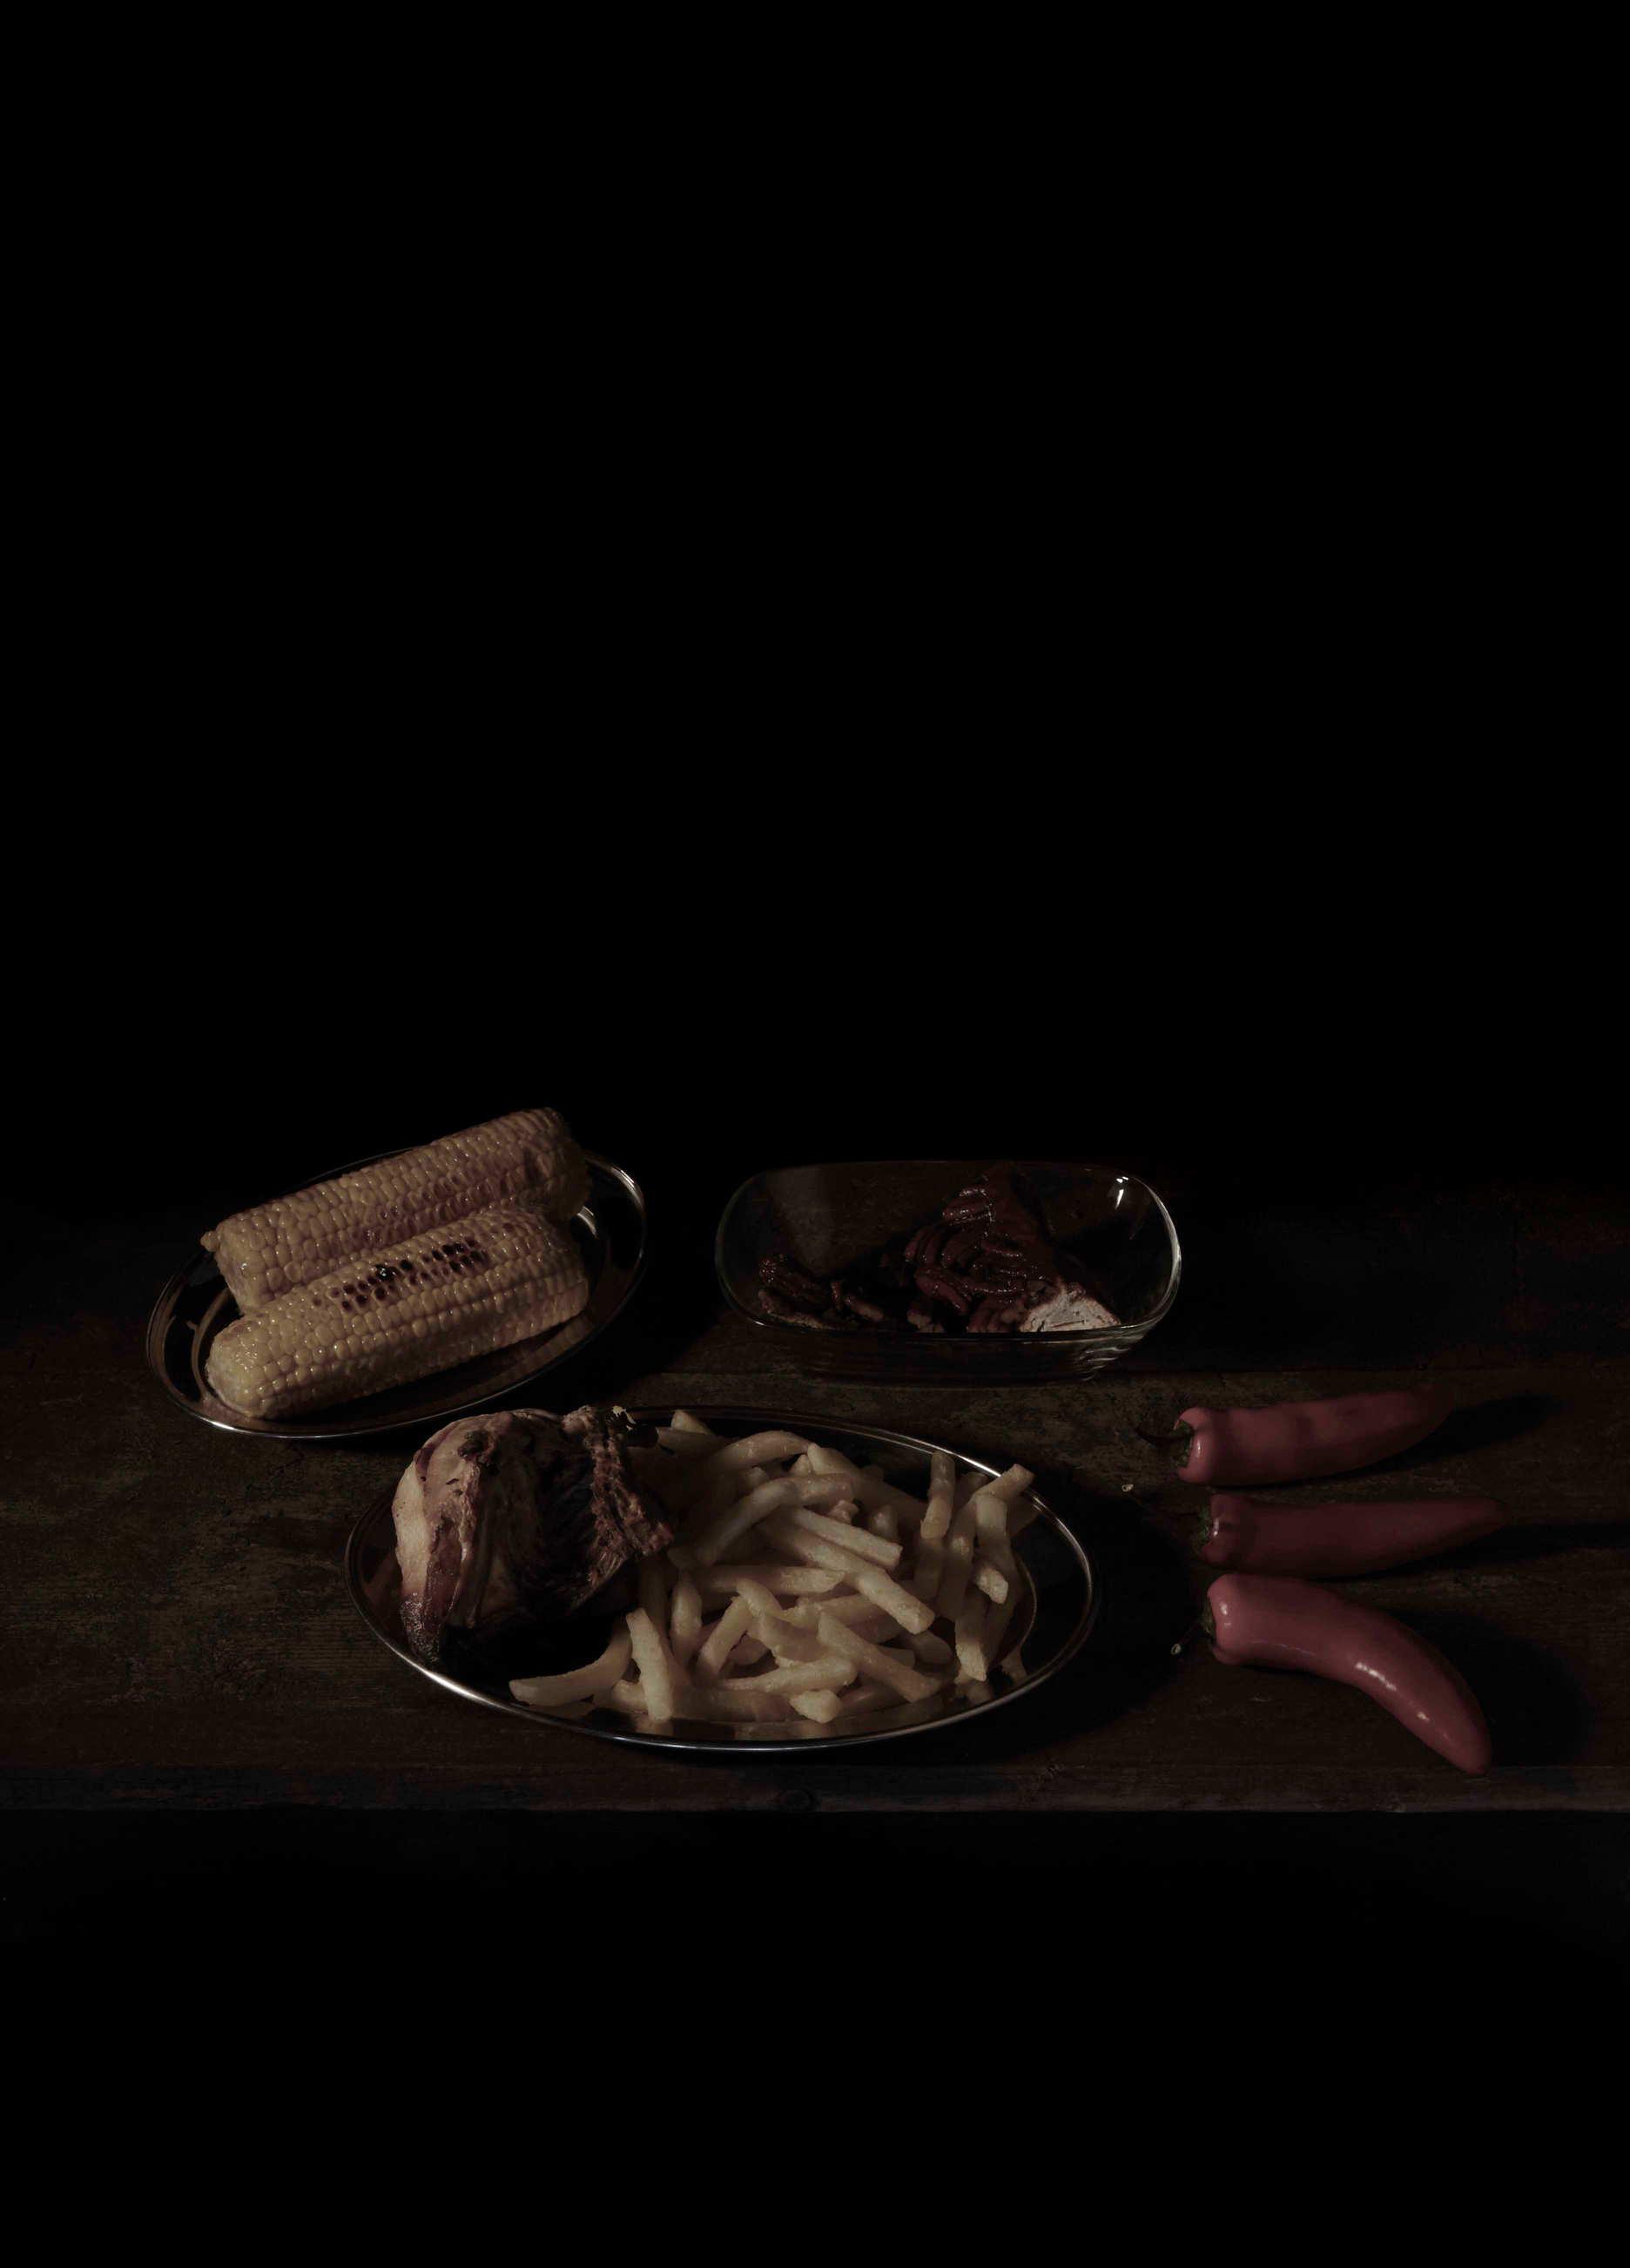 Mat Collishaw-Last Meal on Death Row, Texas (Rudy Esquivel)-2011